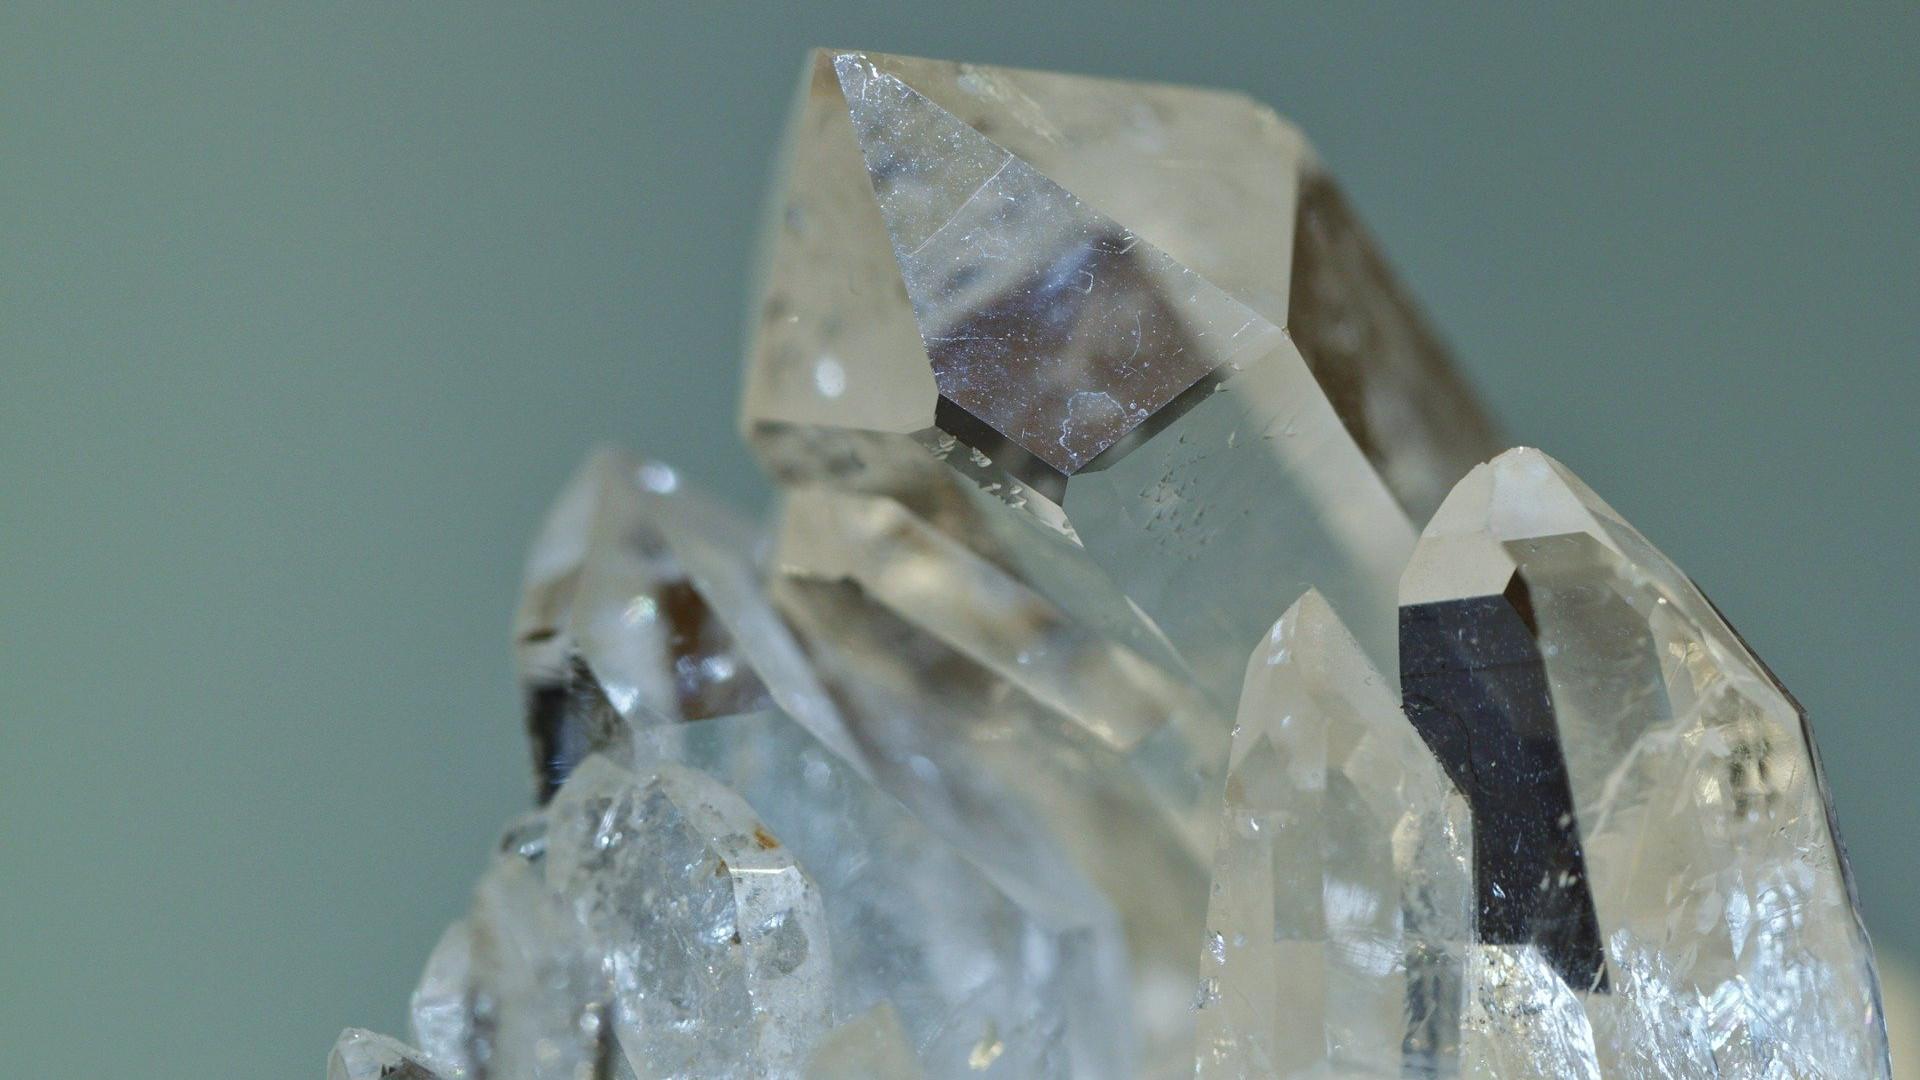 rock-crystal-397955_1920.jpg